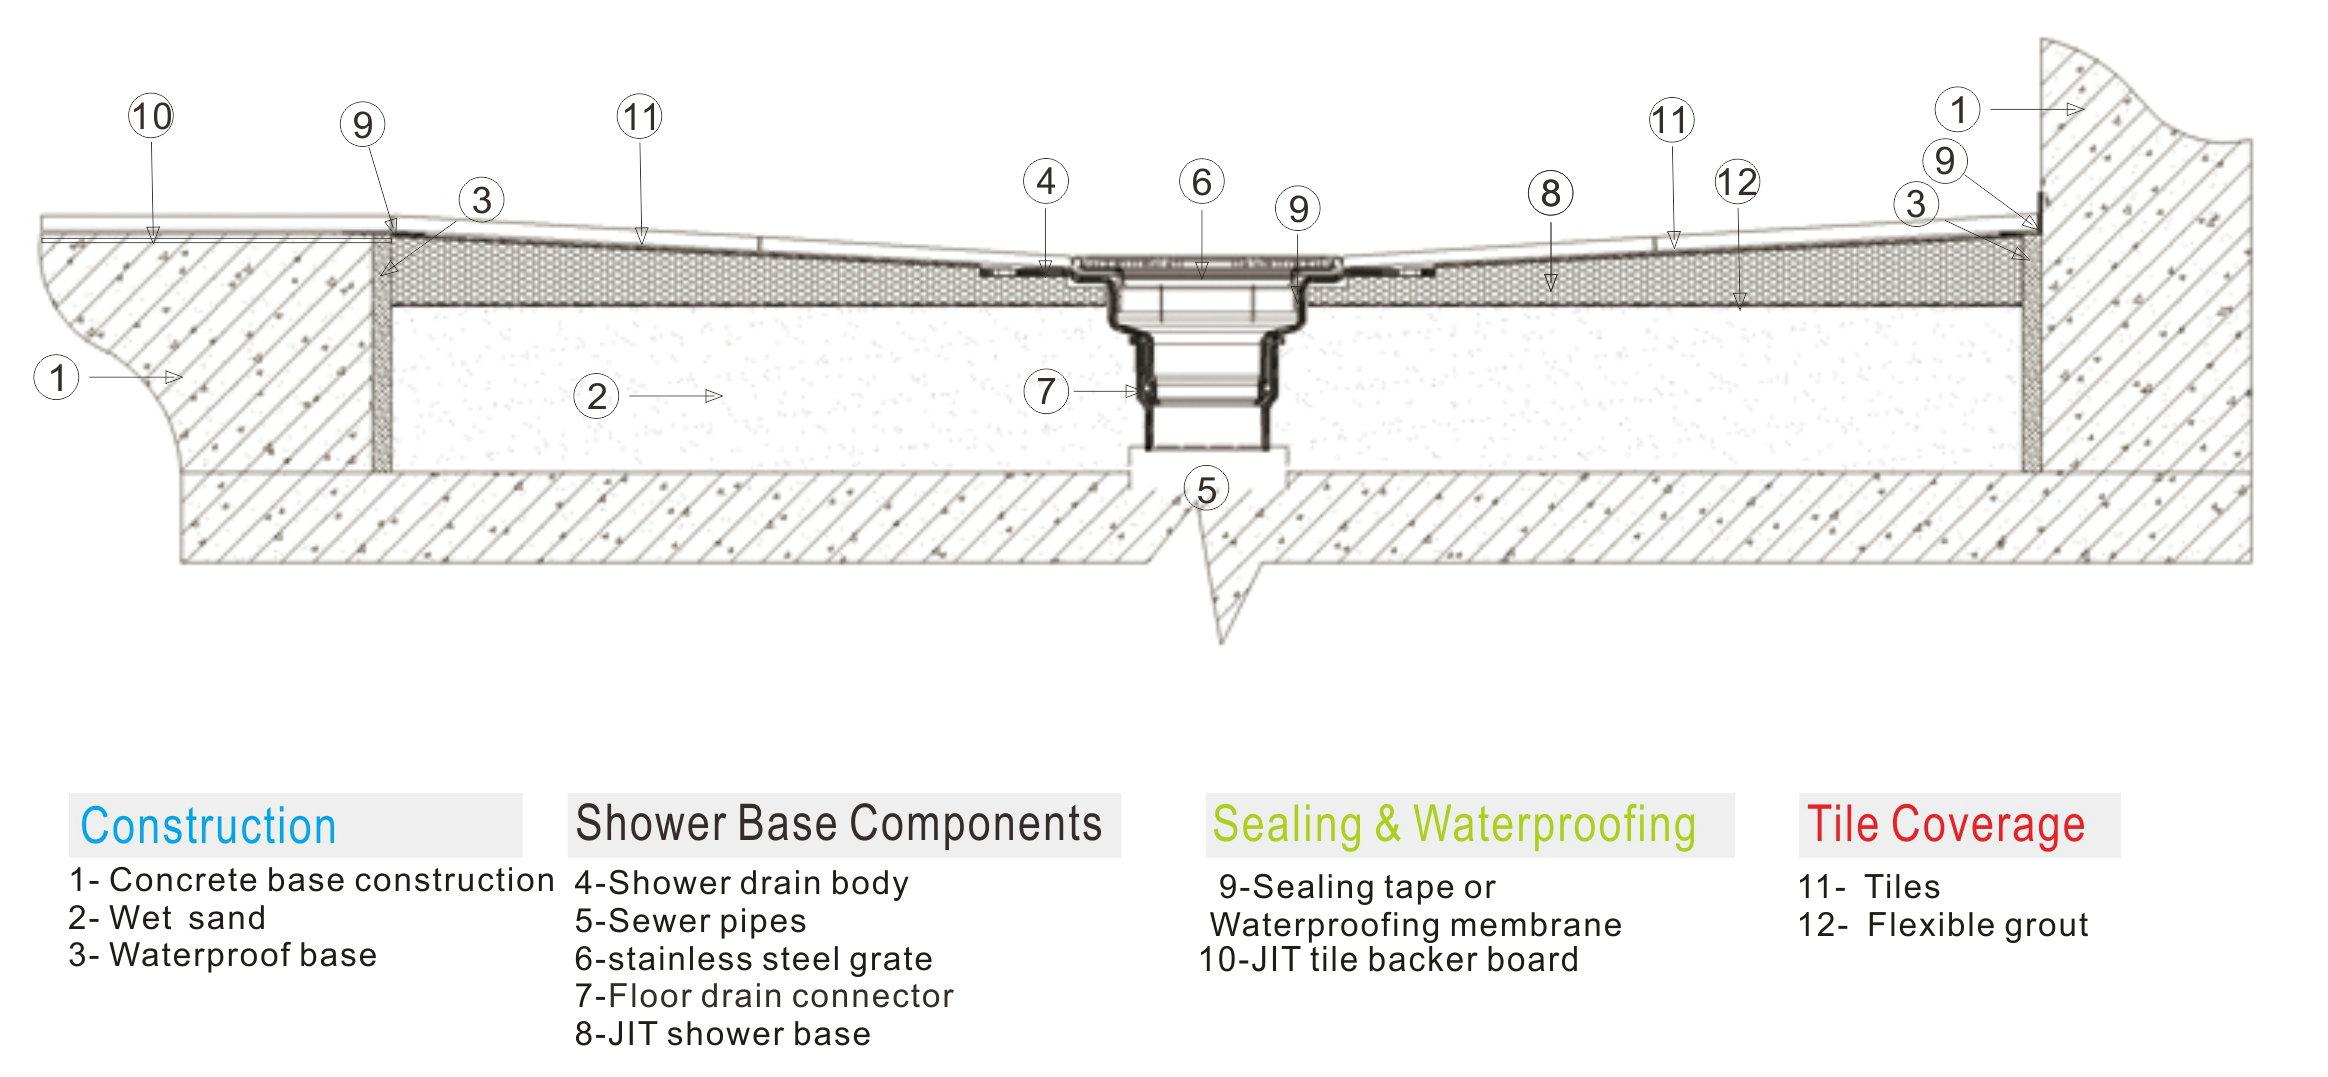 Installation Information For Concrete Floor